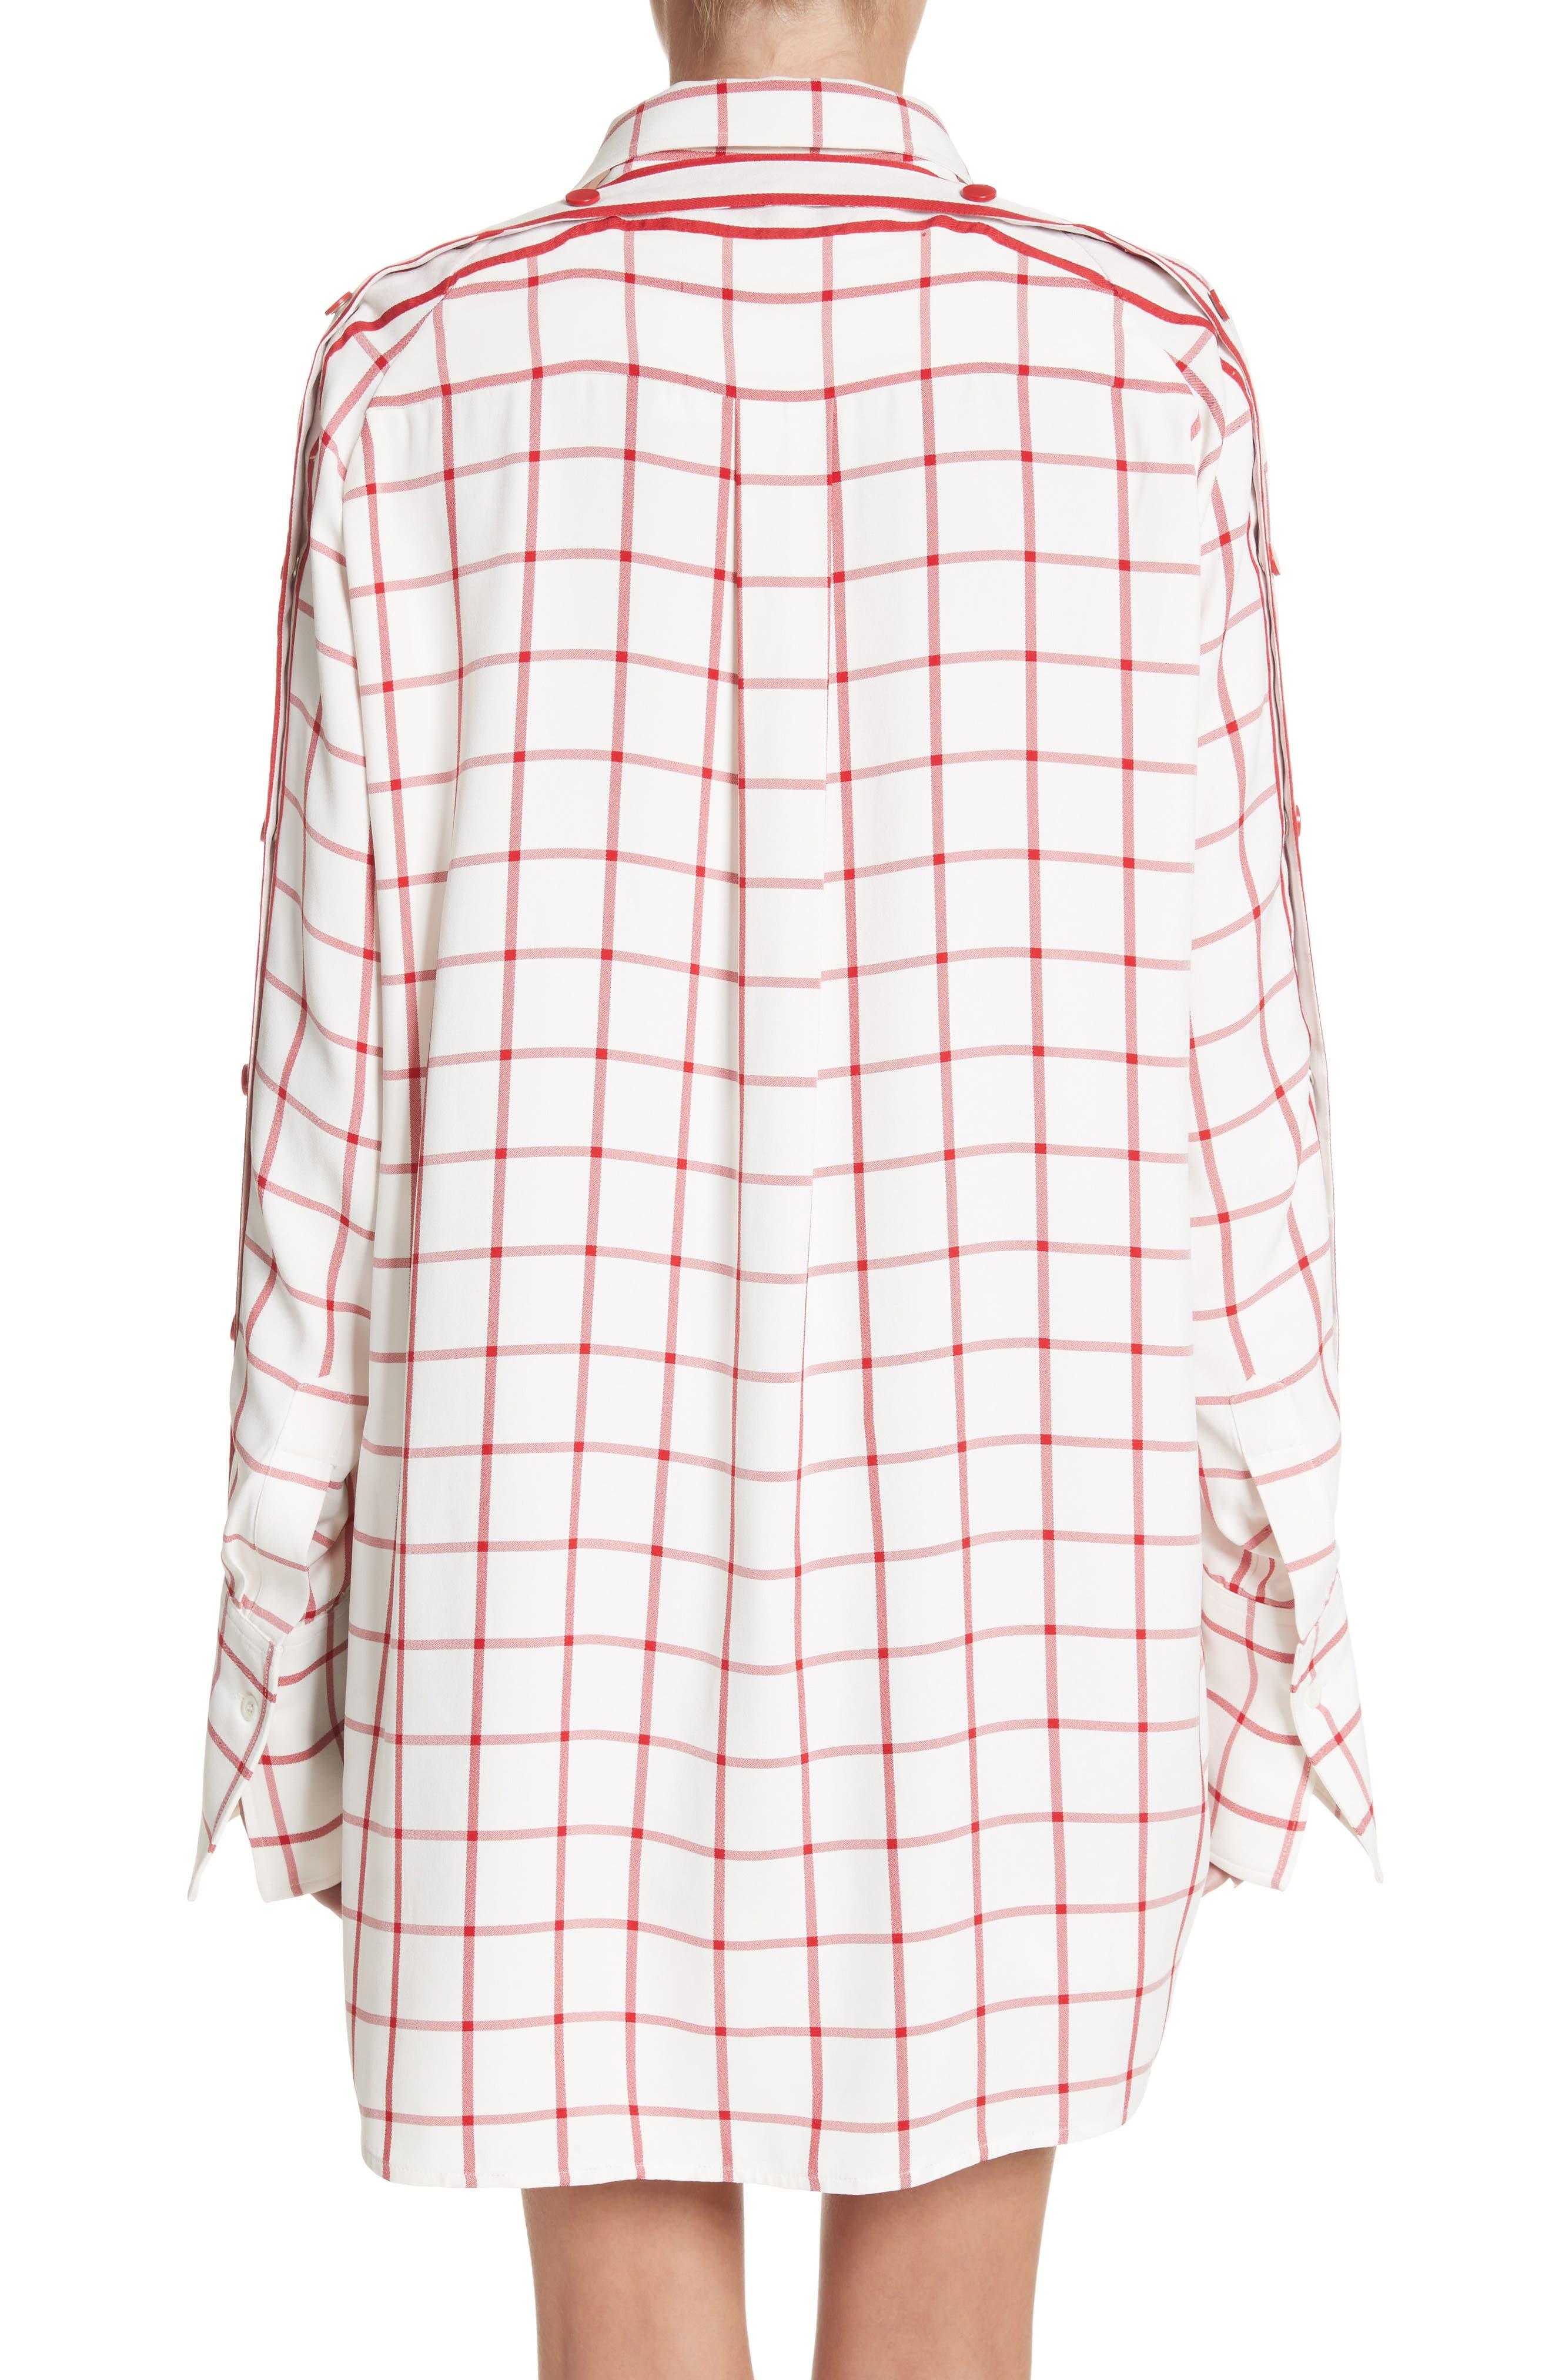 Windowpane Plaid Snap Sleeve Shirt,                             Alternate thumbnail 2, color,                             904